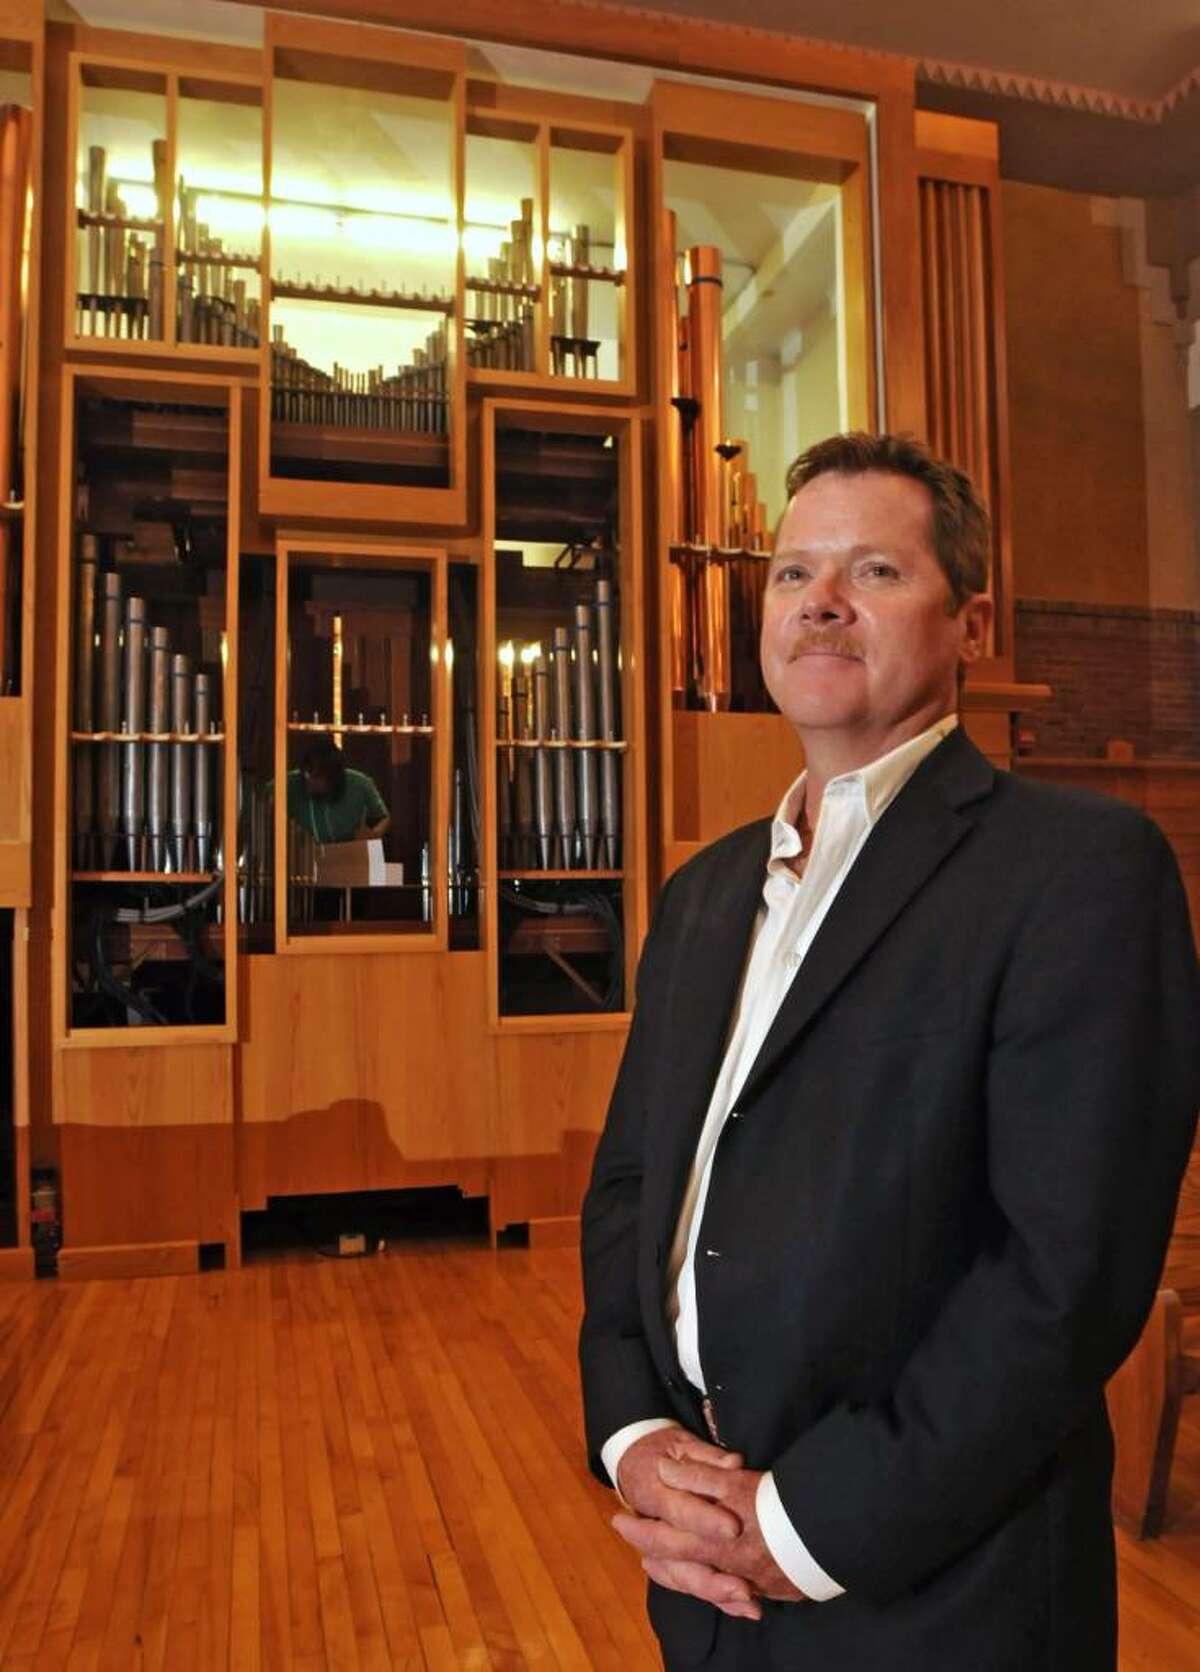 James Cole stands in front of the Ruffatti organ he donated to Doane Stuart School in Rensselaer. (Lori Van Buren / Times Union)